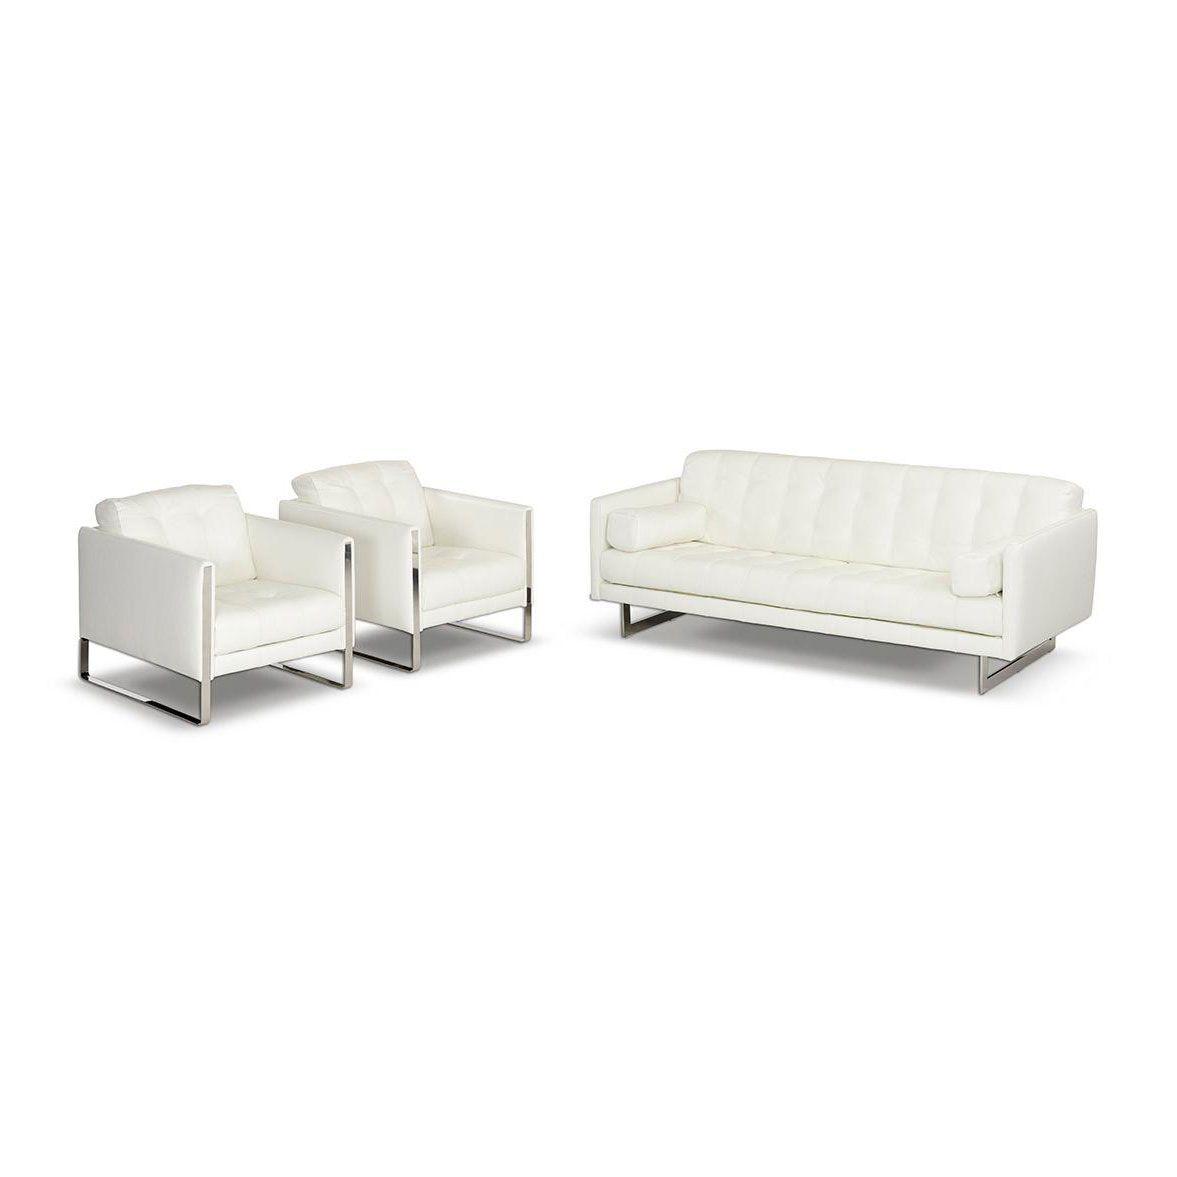 Summer White Sofa Set Leather Sofa Set White Sofa Set Tufted Leather Sofa